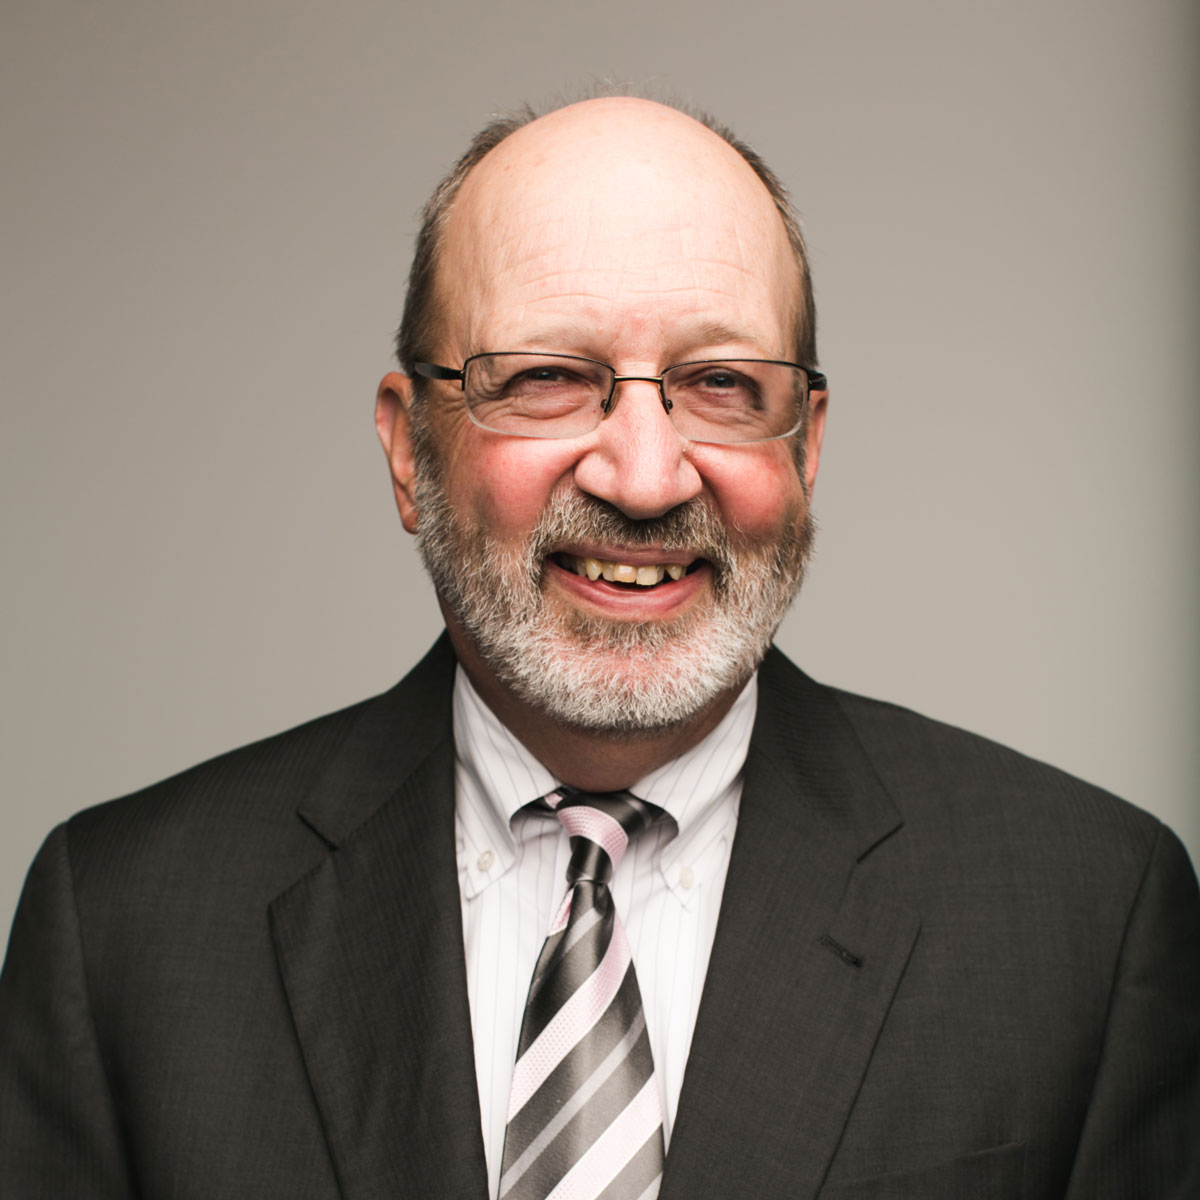 Dr. Fred Nolan